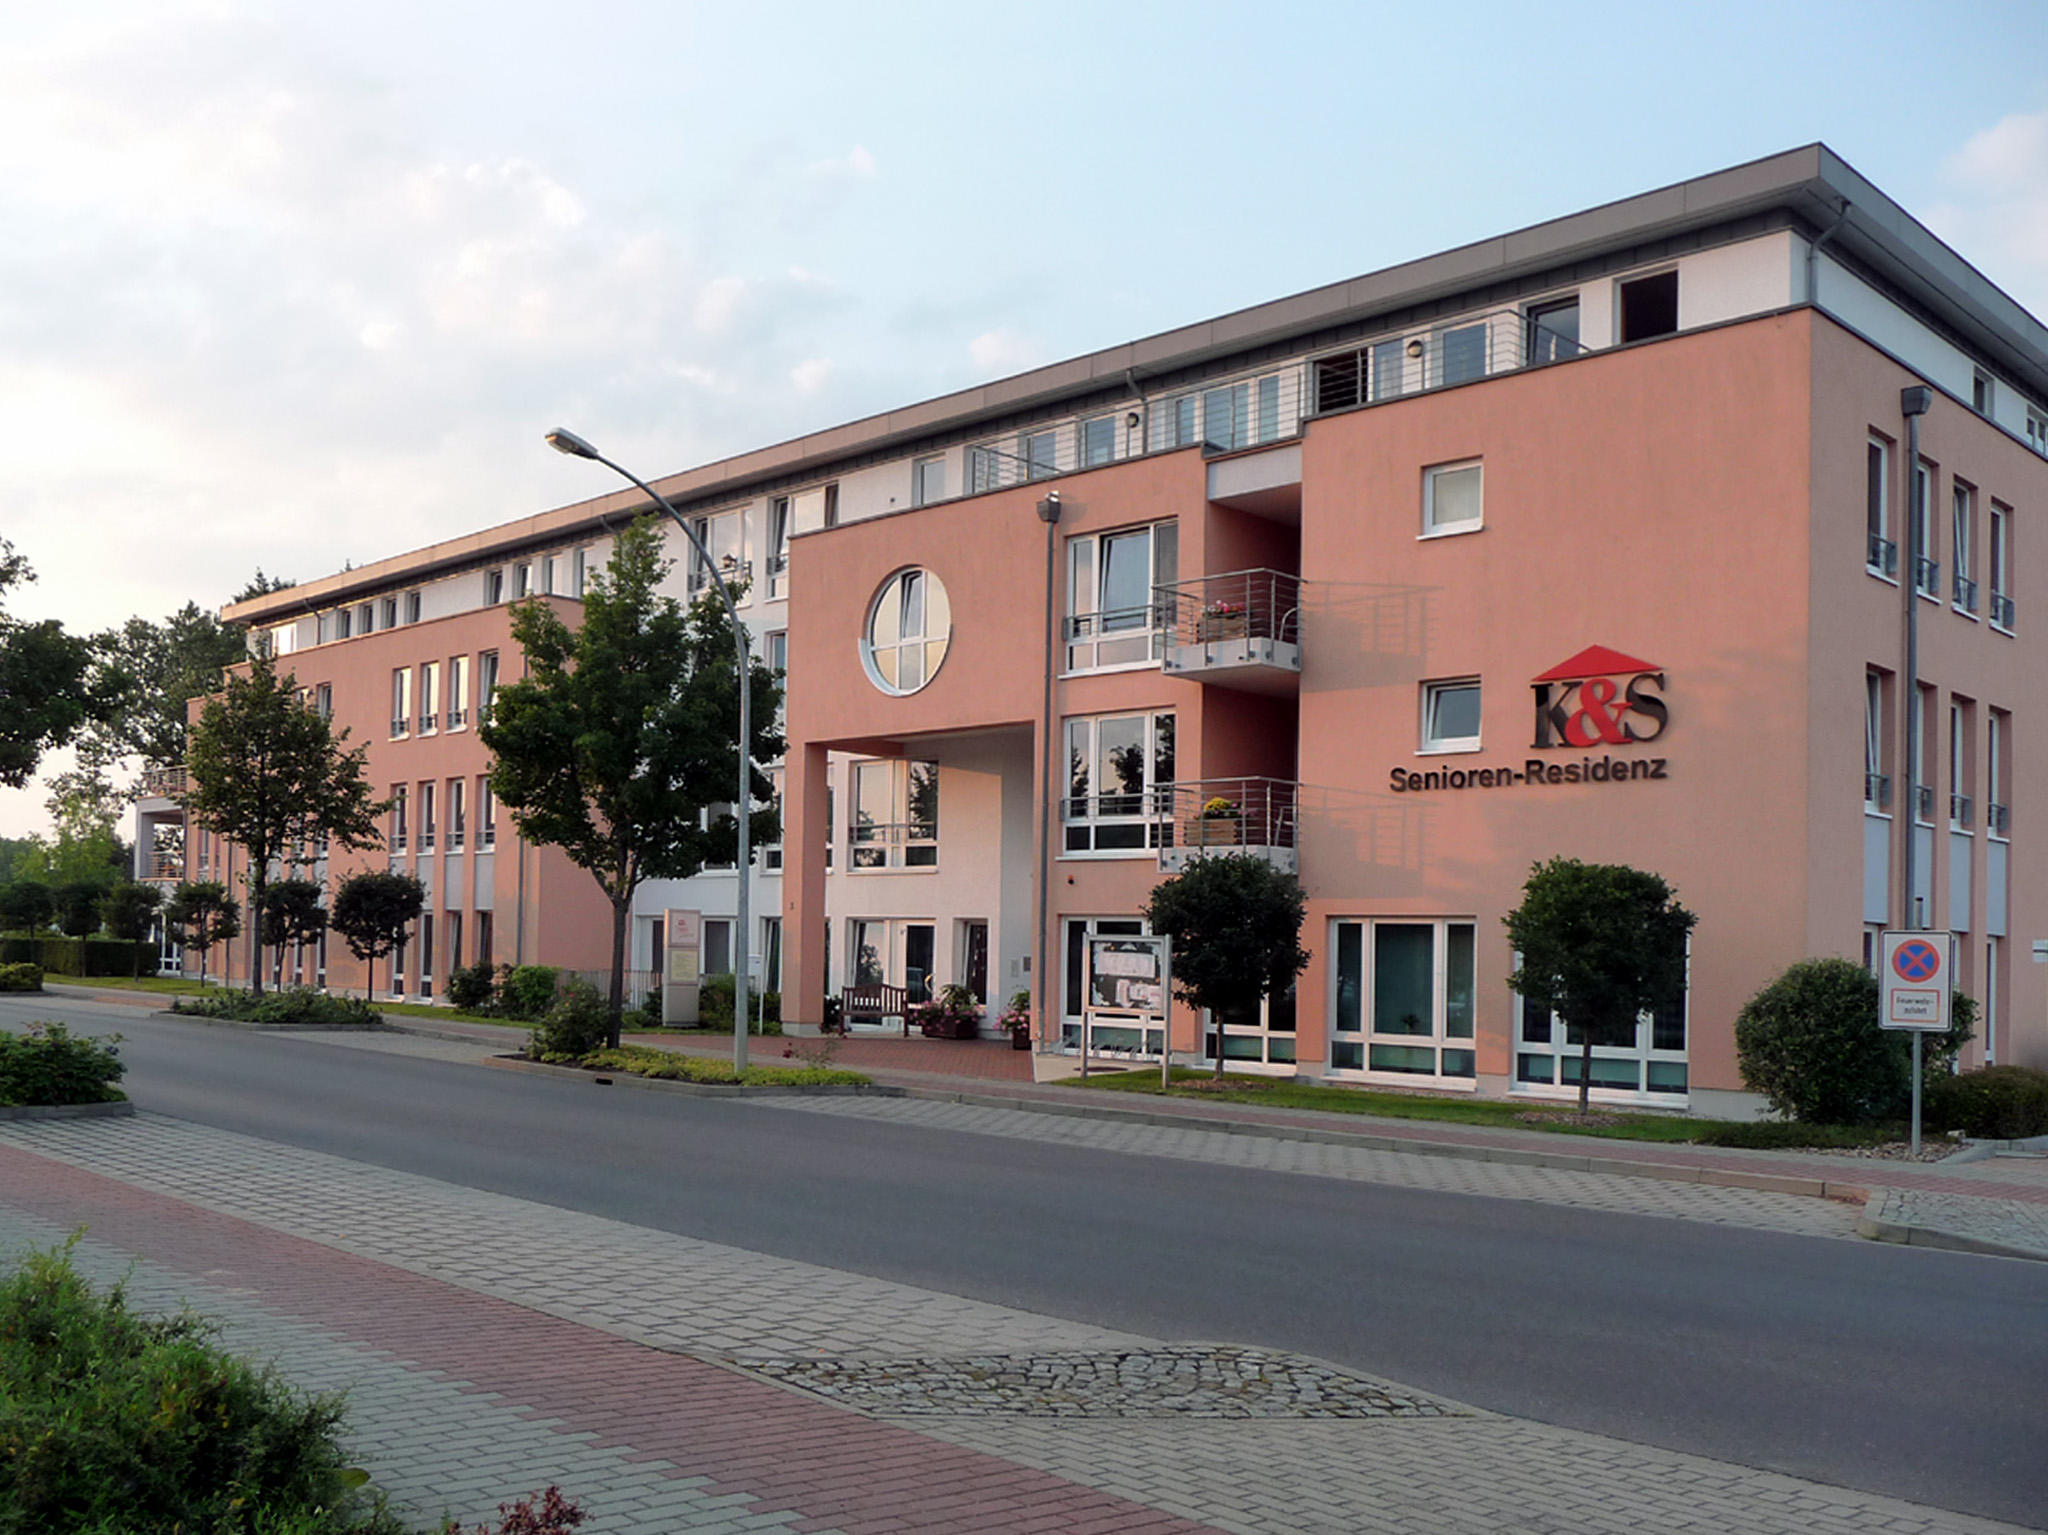 K&S Seniorenresidenz Lübben - Haus Spreewald